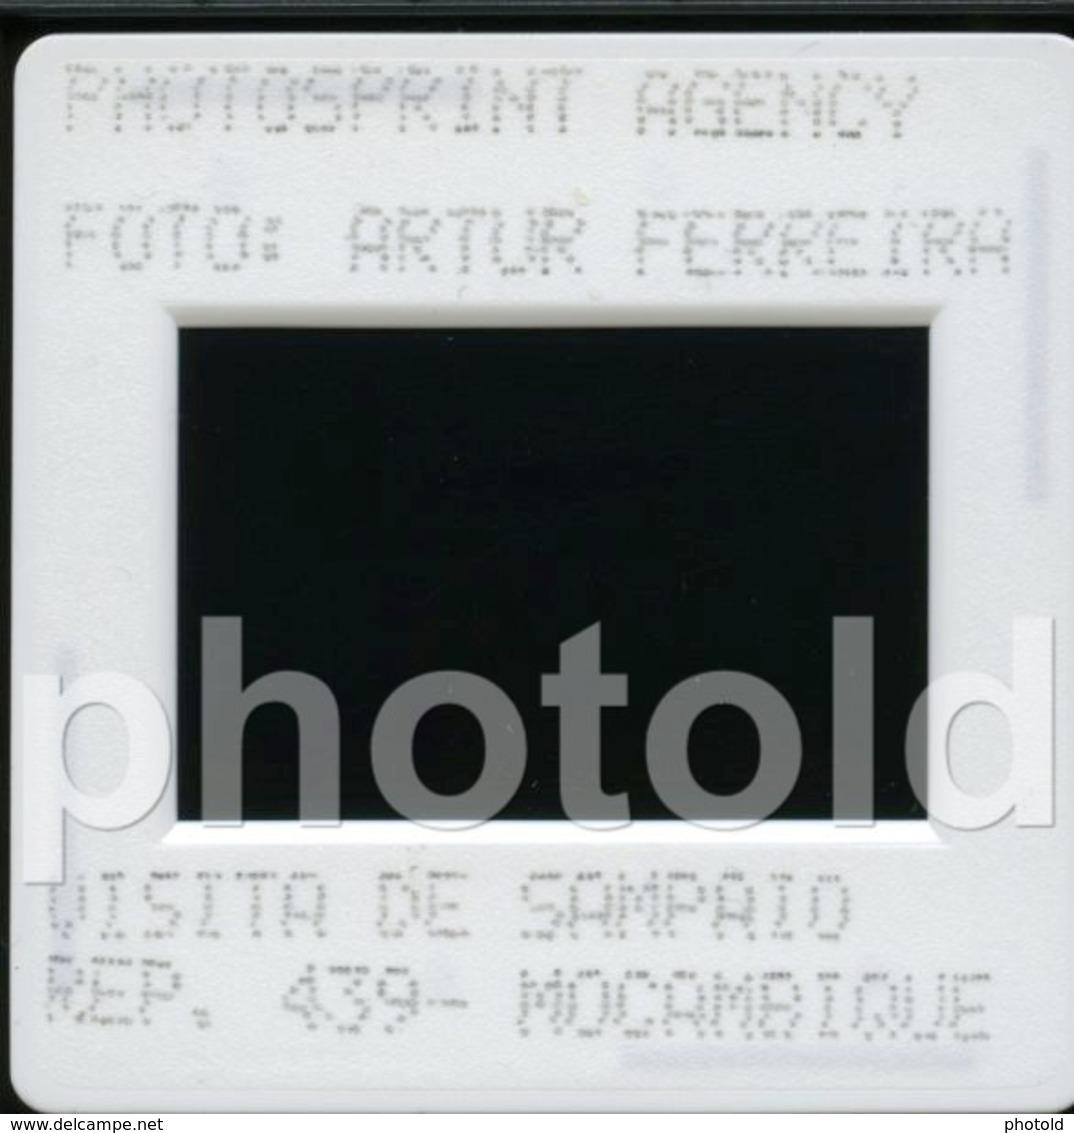 1997 PRESIDENTE PORTUGAL VISITA MOZAMBIQUE PLANE TAP AFRICA AFRIQUE 35mm PRESS DIAPOSITIVE SLIDE Not PHOTO No FOTO B4923 - Dias